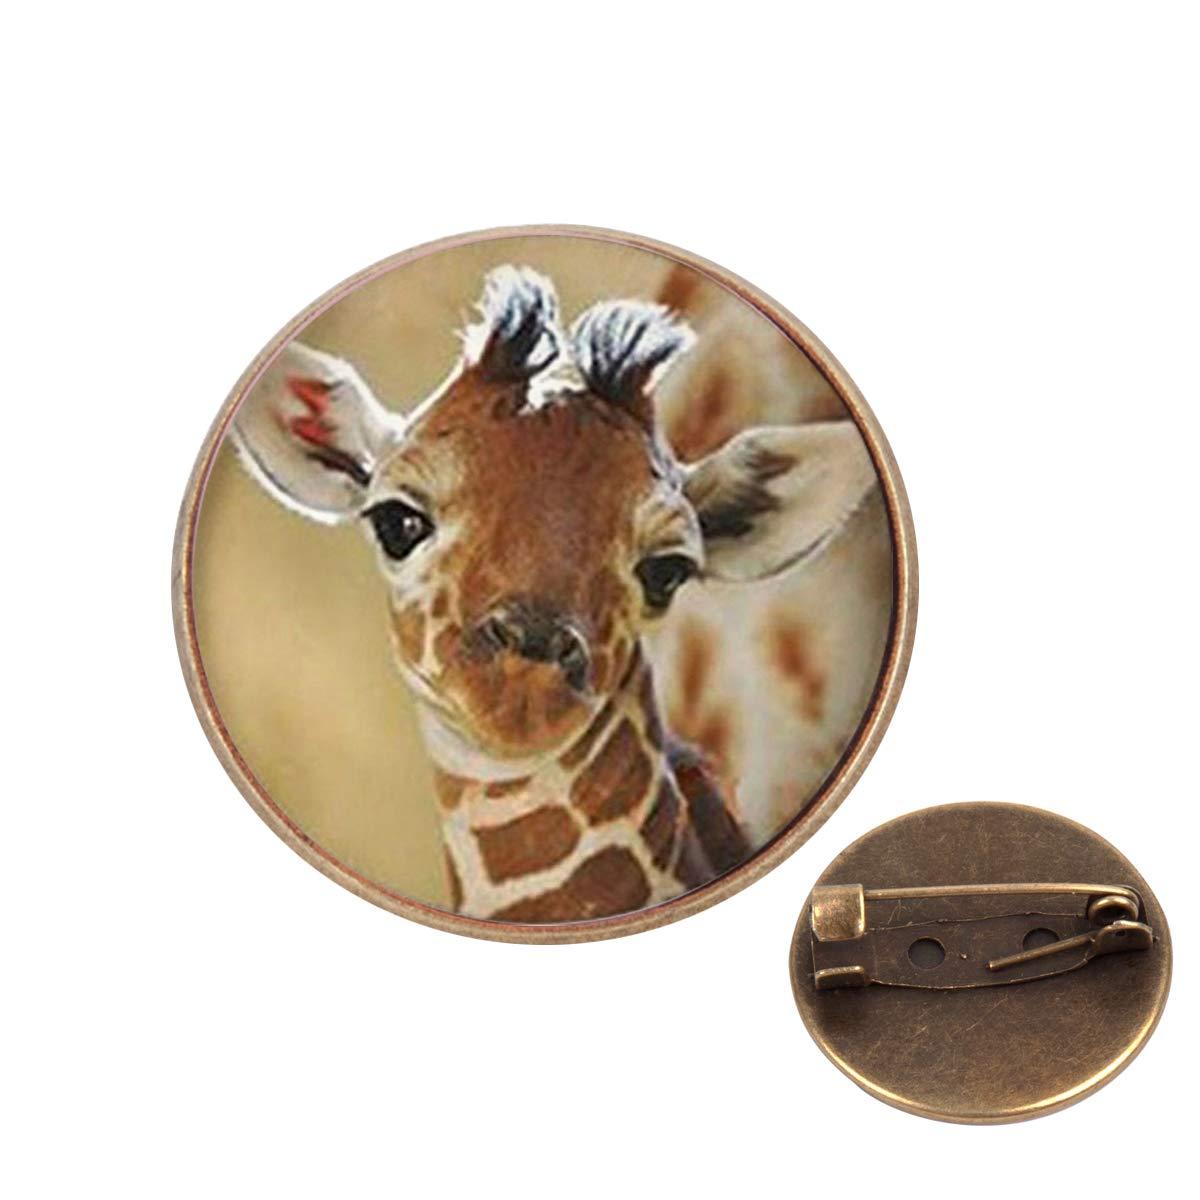 Pinback Buttons Badges Pins Cute Baby Giraffe Lapel Pin Brooch Clip Trendy Accessory Jacket T-Shirt Bag Hat Shoe